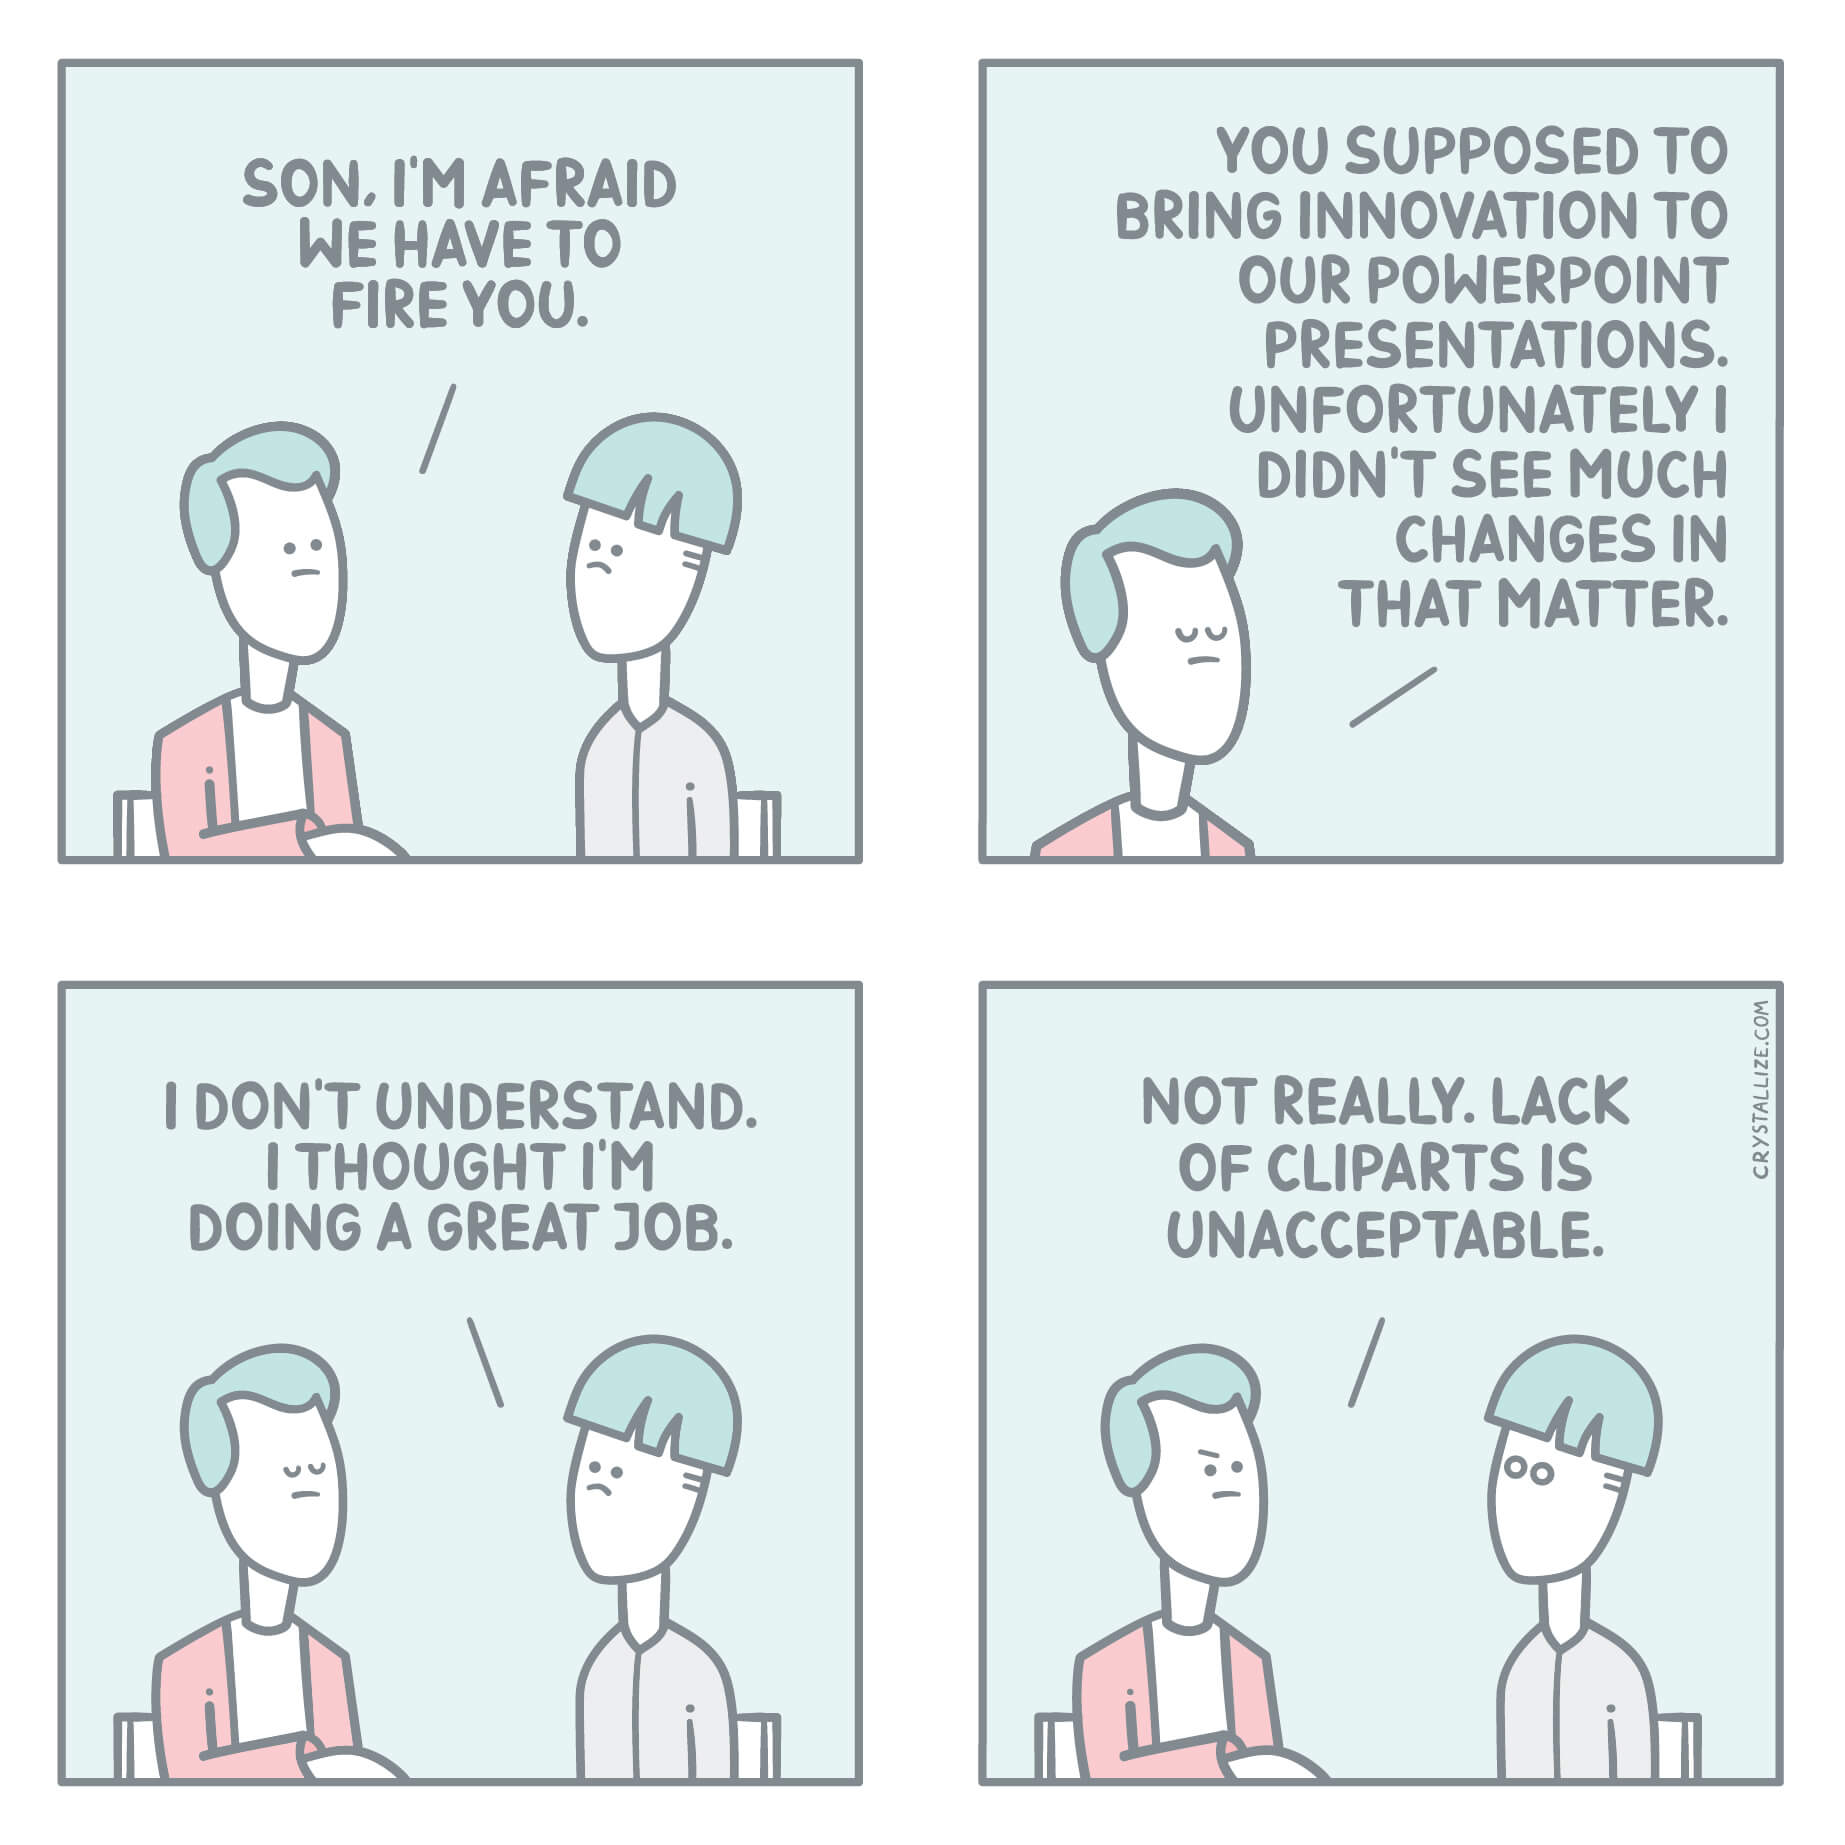 Innovative Presentations